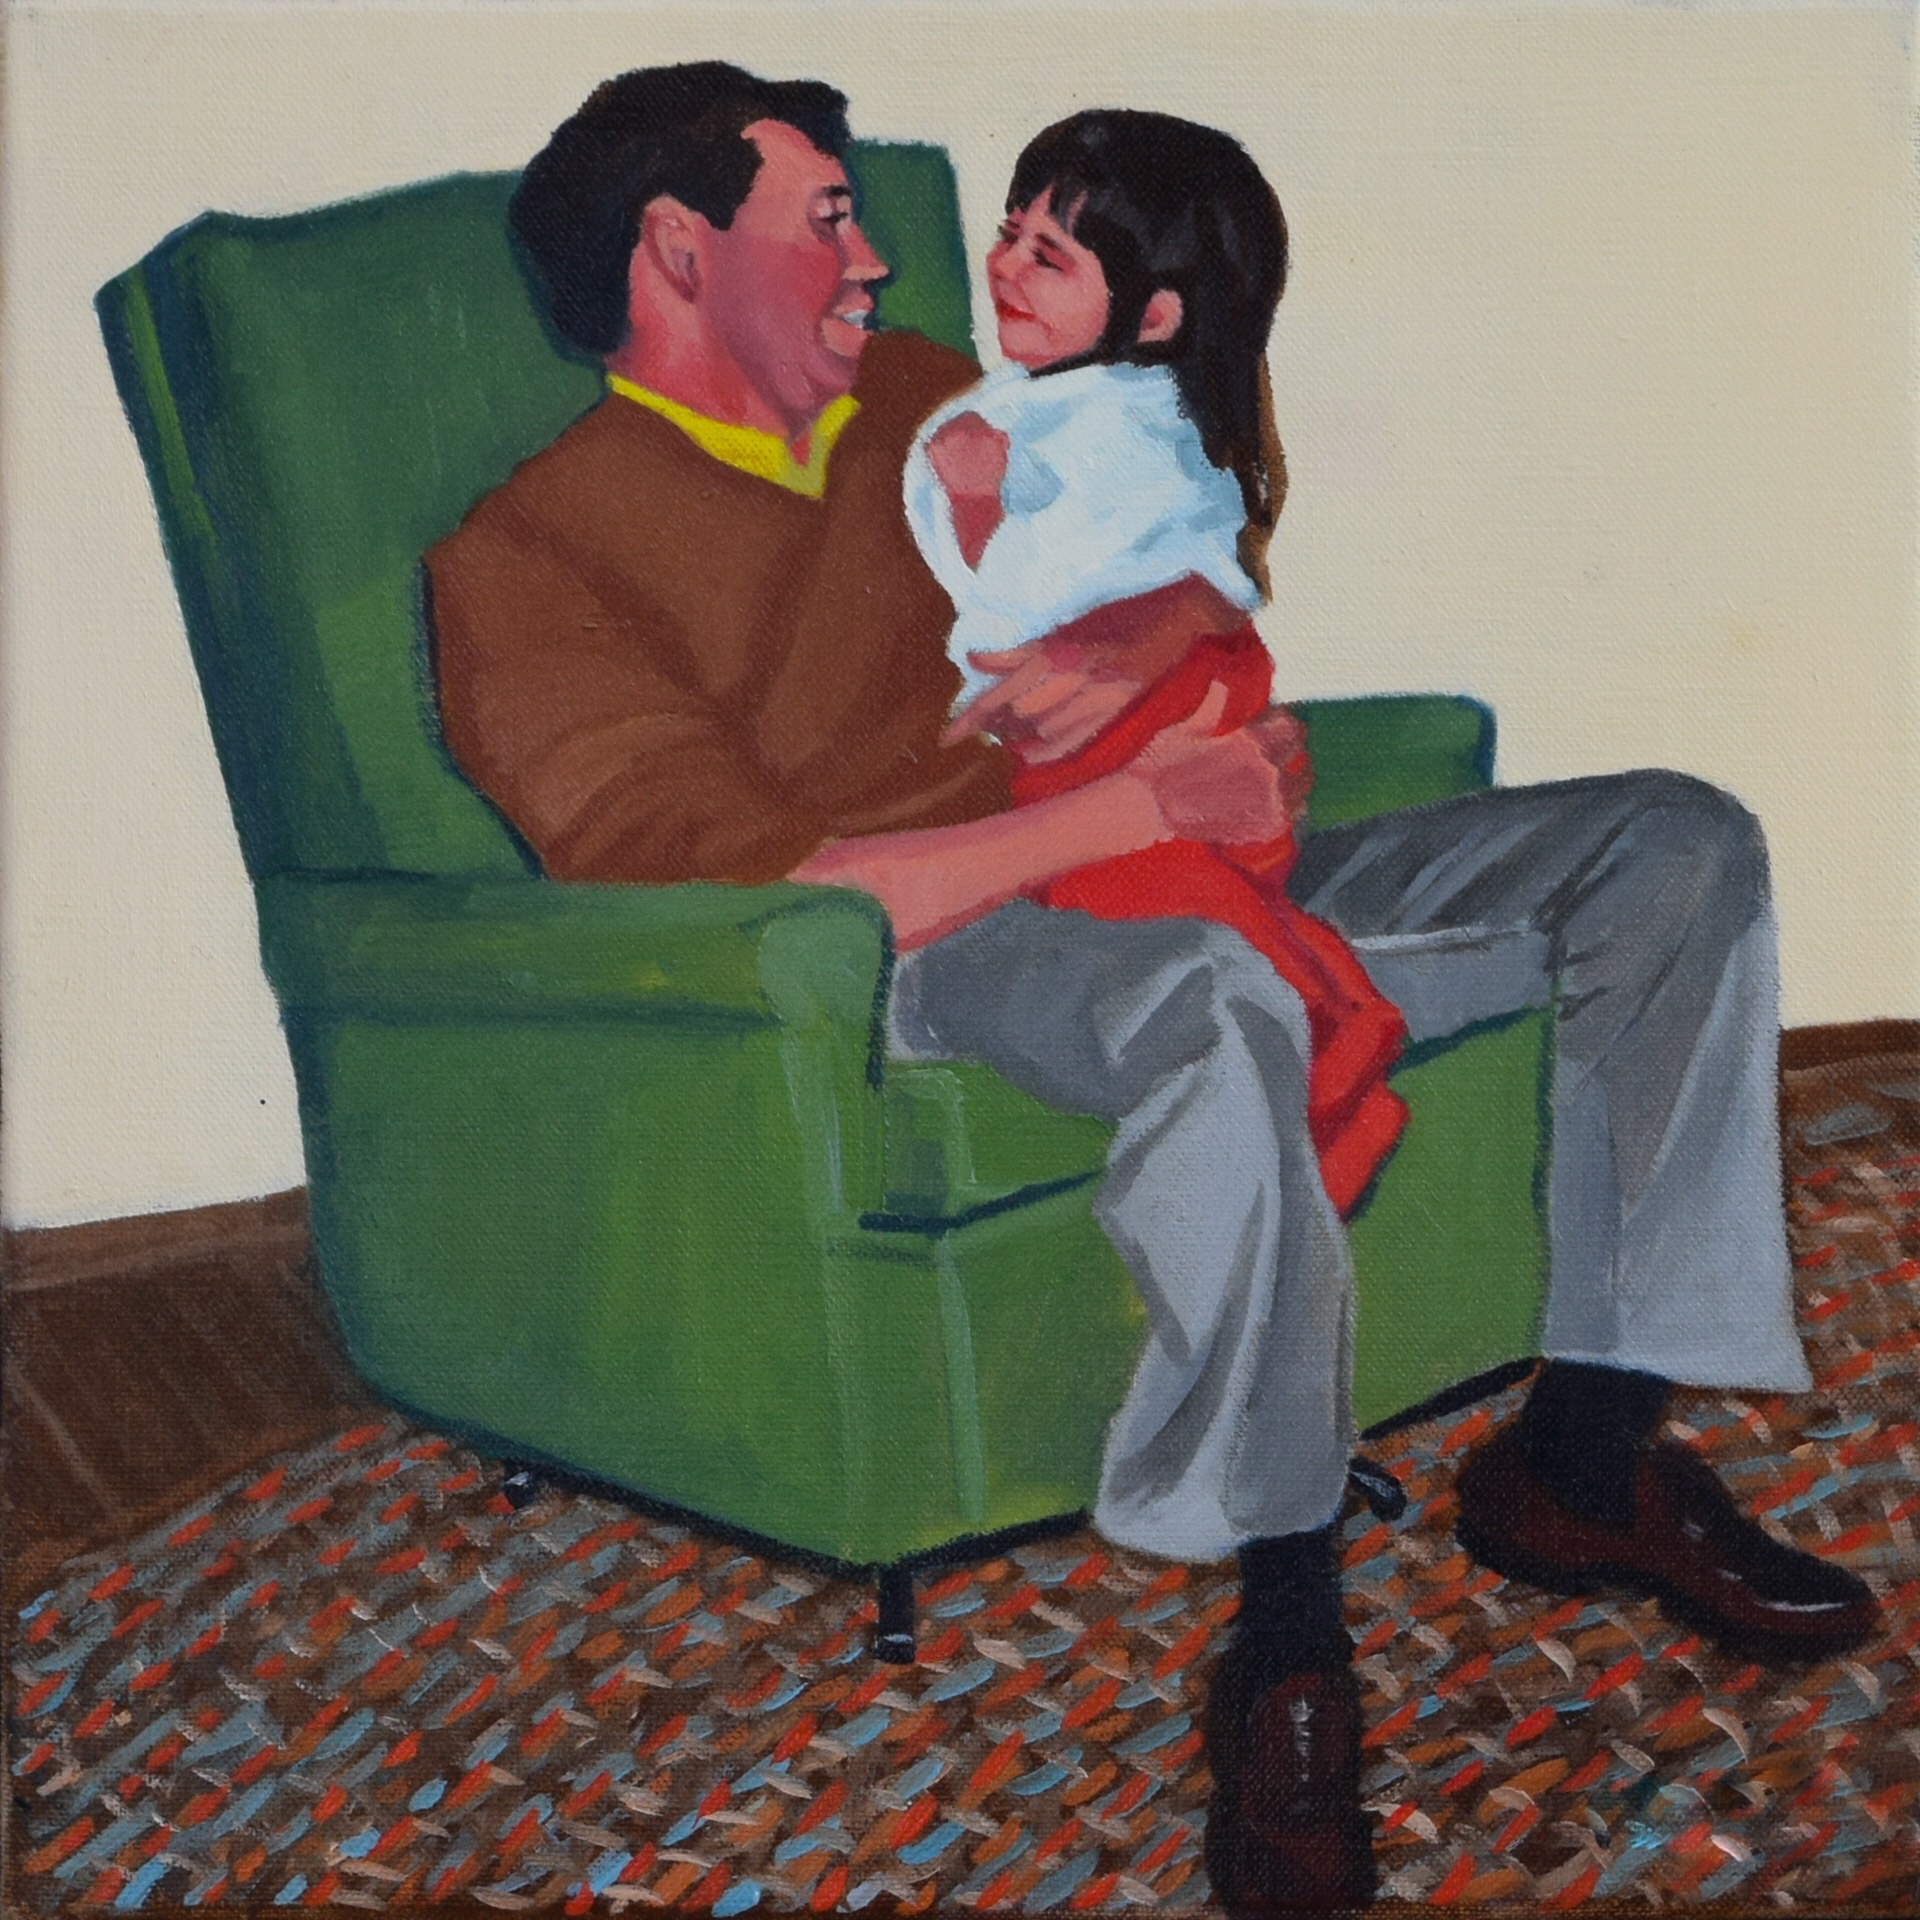 Baker, Margaret-Green Chair-12x12 inch oil on canvas.jpg